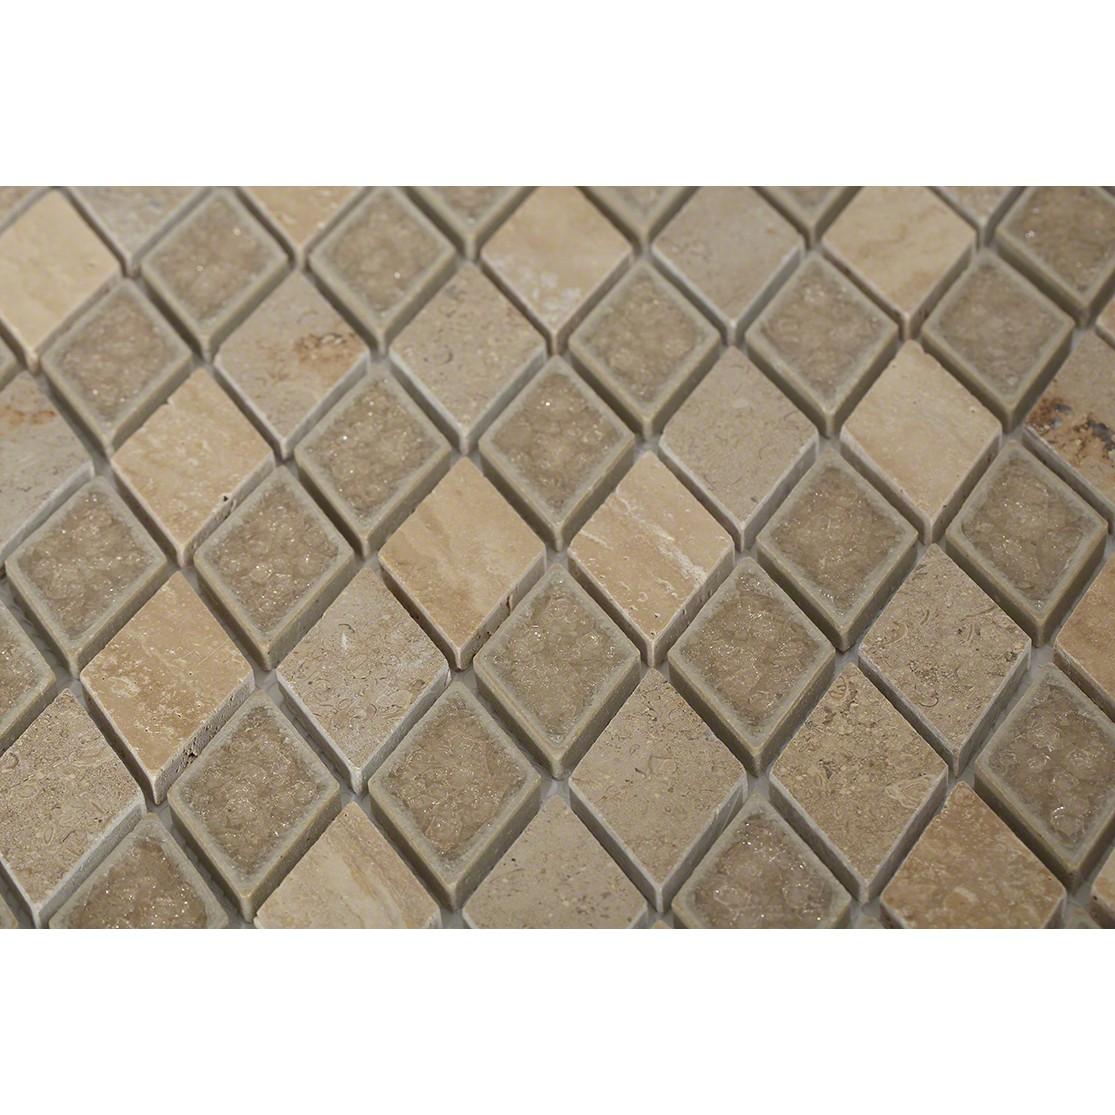 Shop 12x12 Roman Collection Desert Tan Diamond Mosaic In A